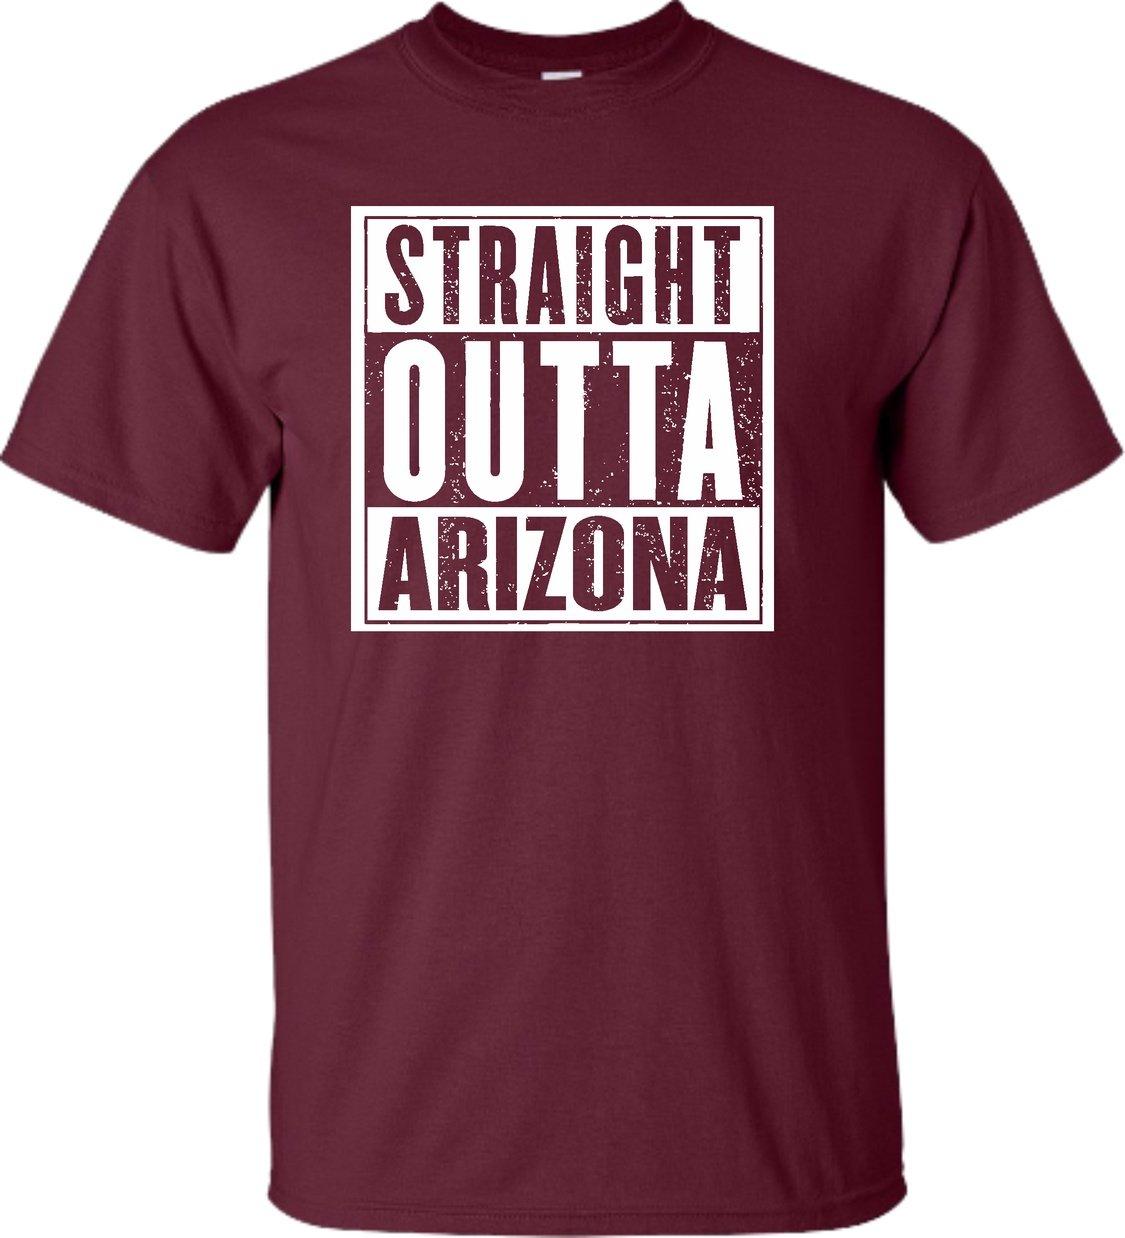 Adult Straight Outta Arizona T Shirt 3731